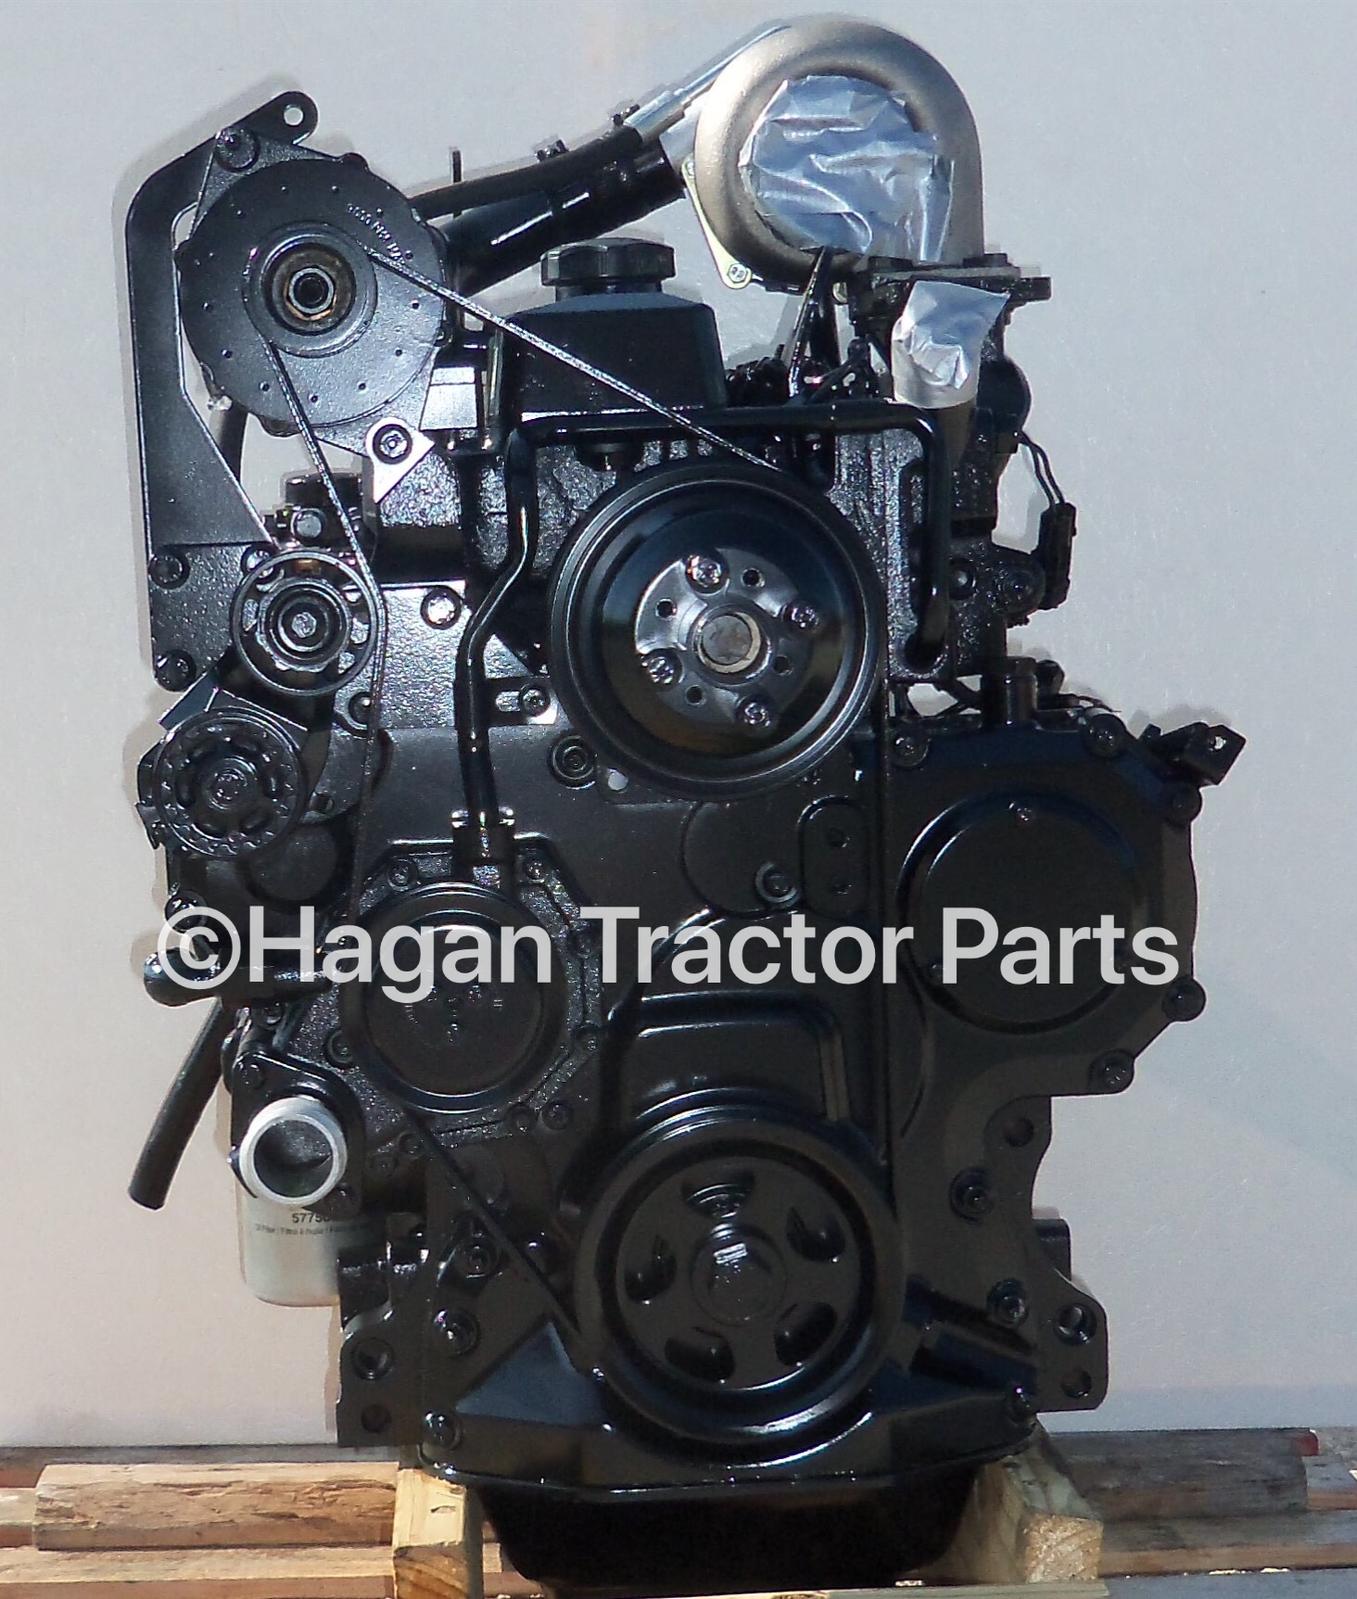 Case 188 Diesel Engine For Sale